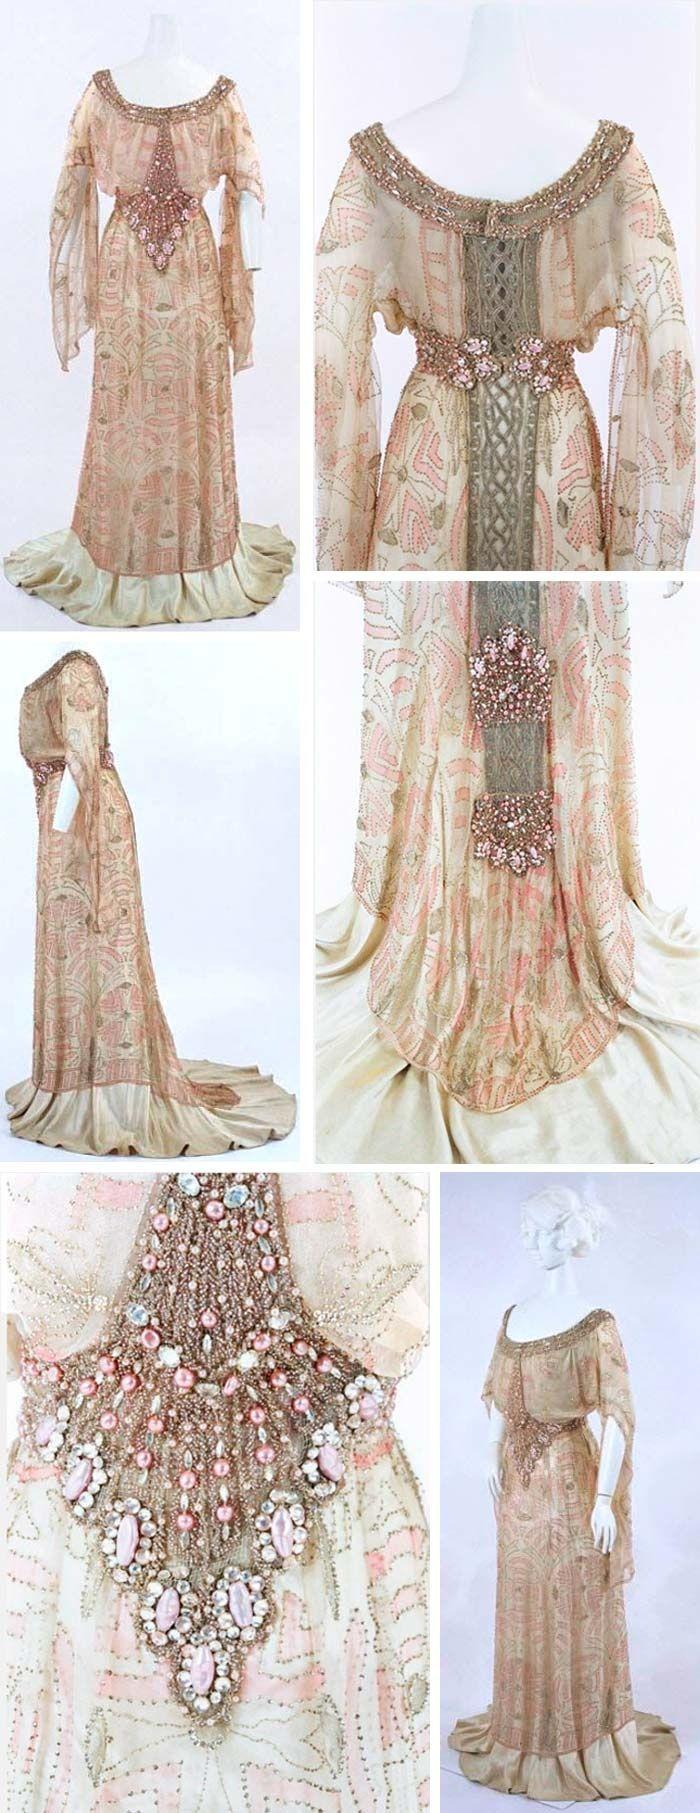 "Evening dress, Jacques Doucet, circa 1910. Silk satin and chiffon, beads, faux pearls, and rhinestones. ""Pouter pigeon"" bodice creating ""S"" shape. Via Bunka Gakuen Costume Museum, Tokyo."